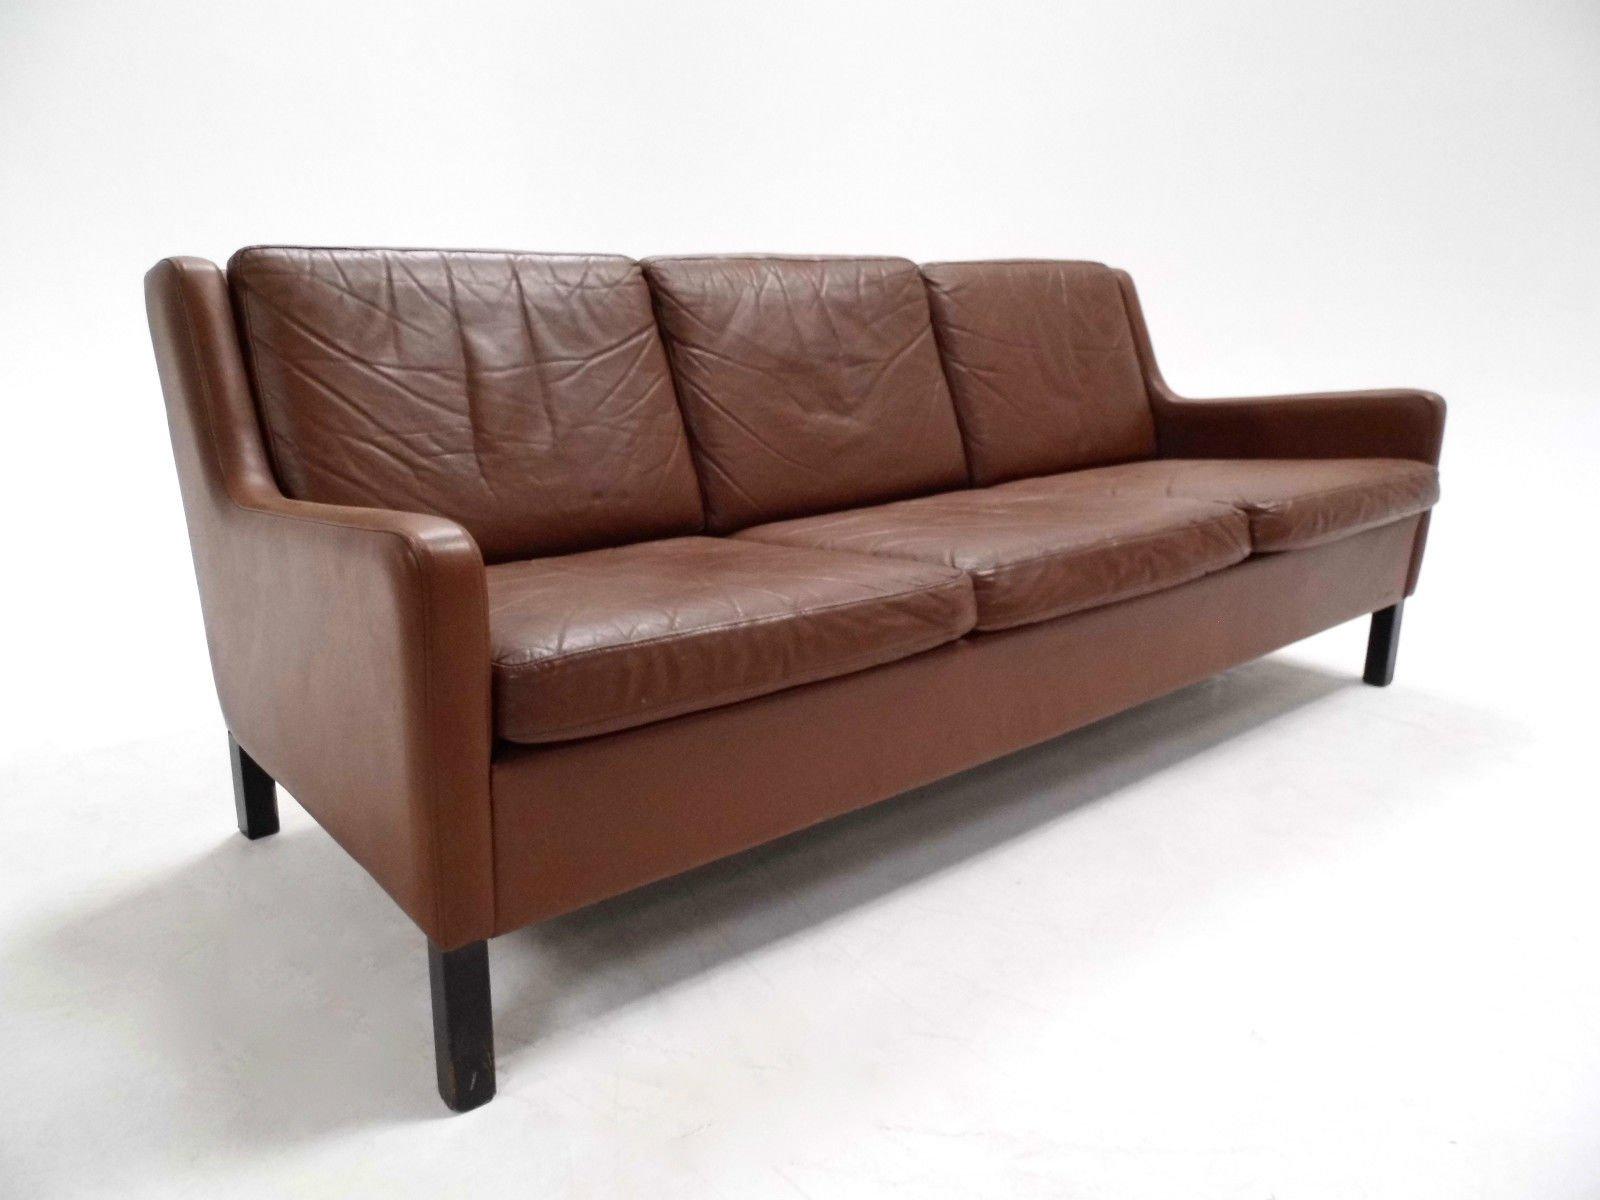 d nisches braunes drei sitzer ledersofa 1960er bei pamono. Black Bedroom Furniture Sets. Home Design Ideas